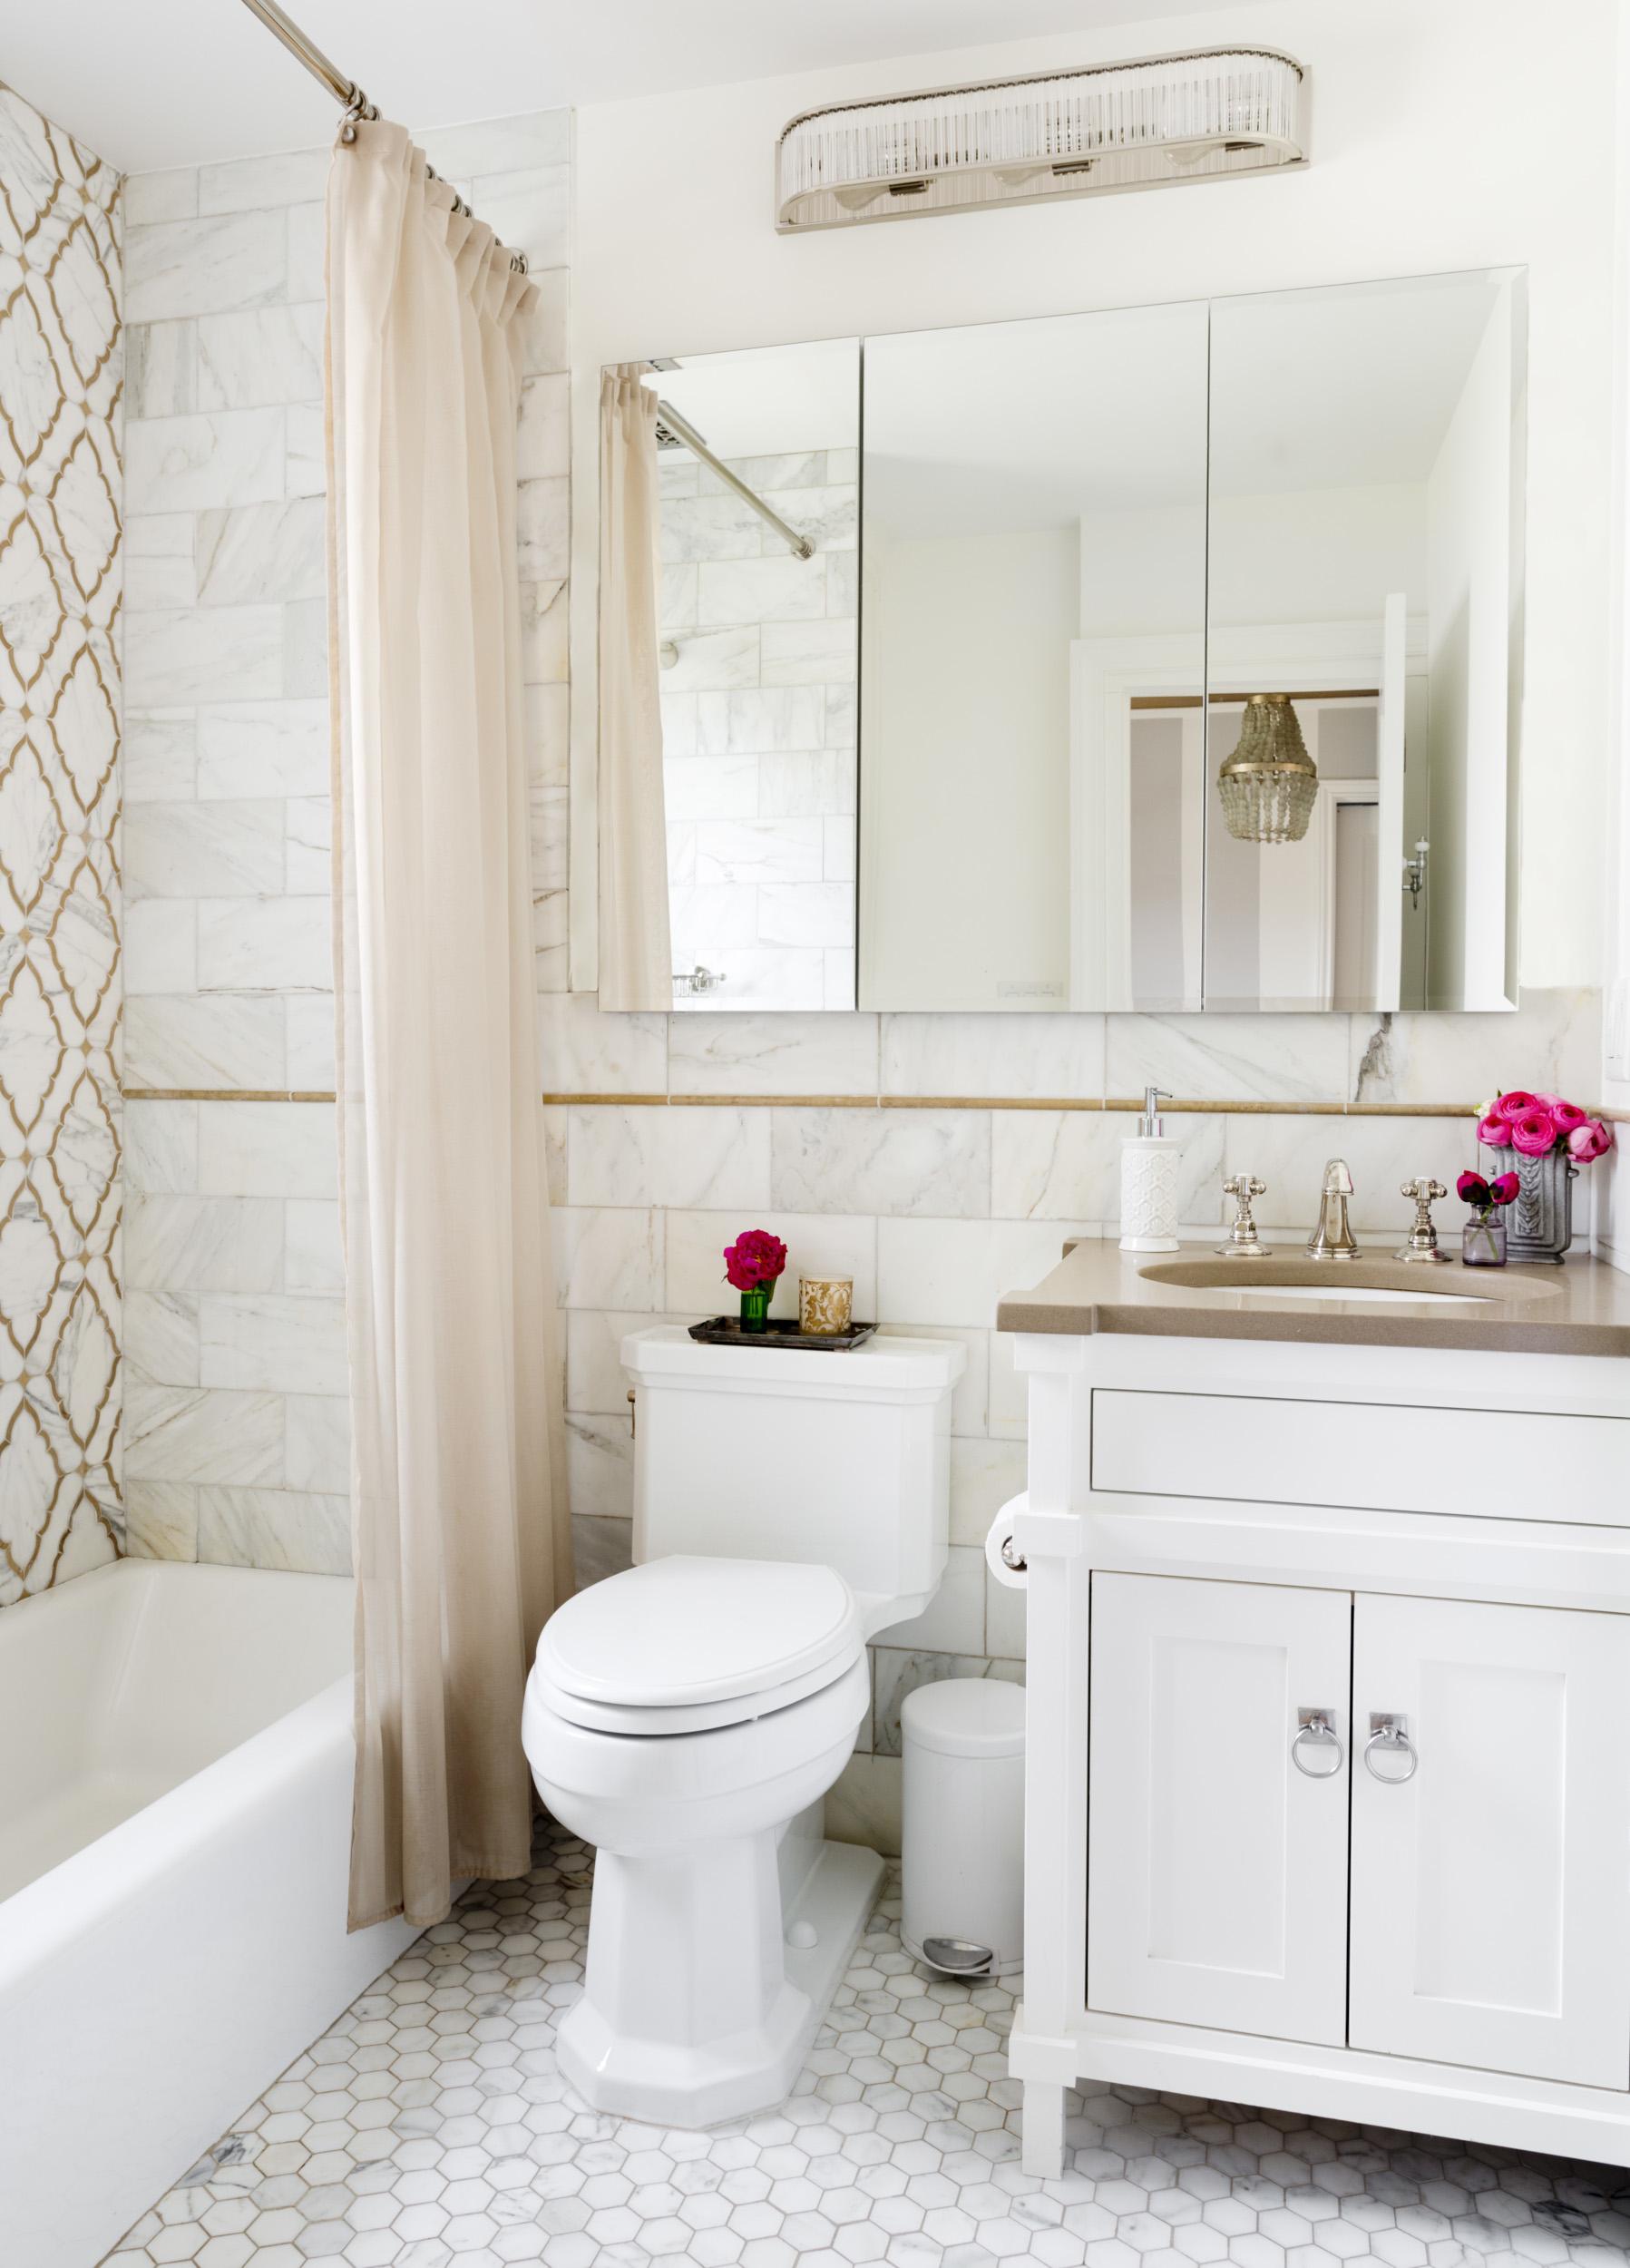 Caroline Kopp Connecticut Bathroom designers.jpg